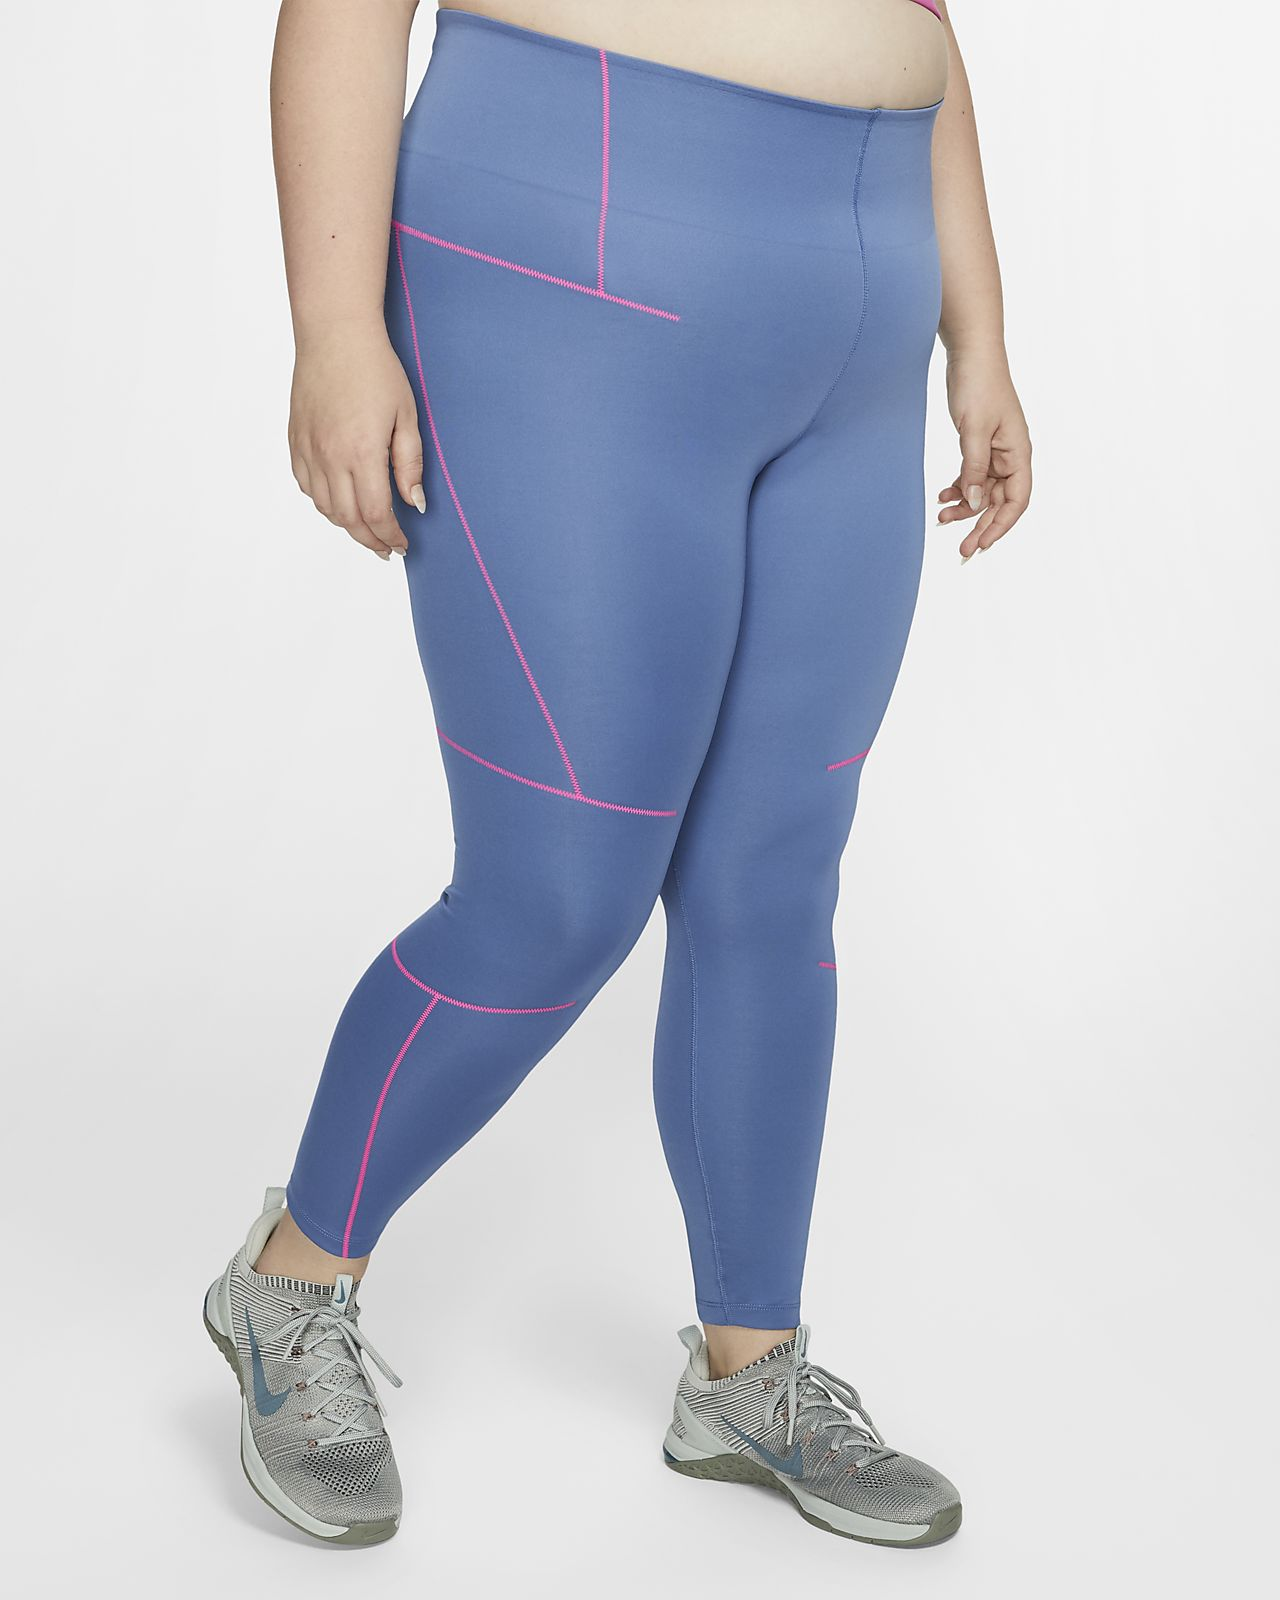 Legging de training Nike pour Femme (grande taille)